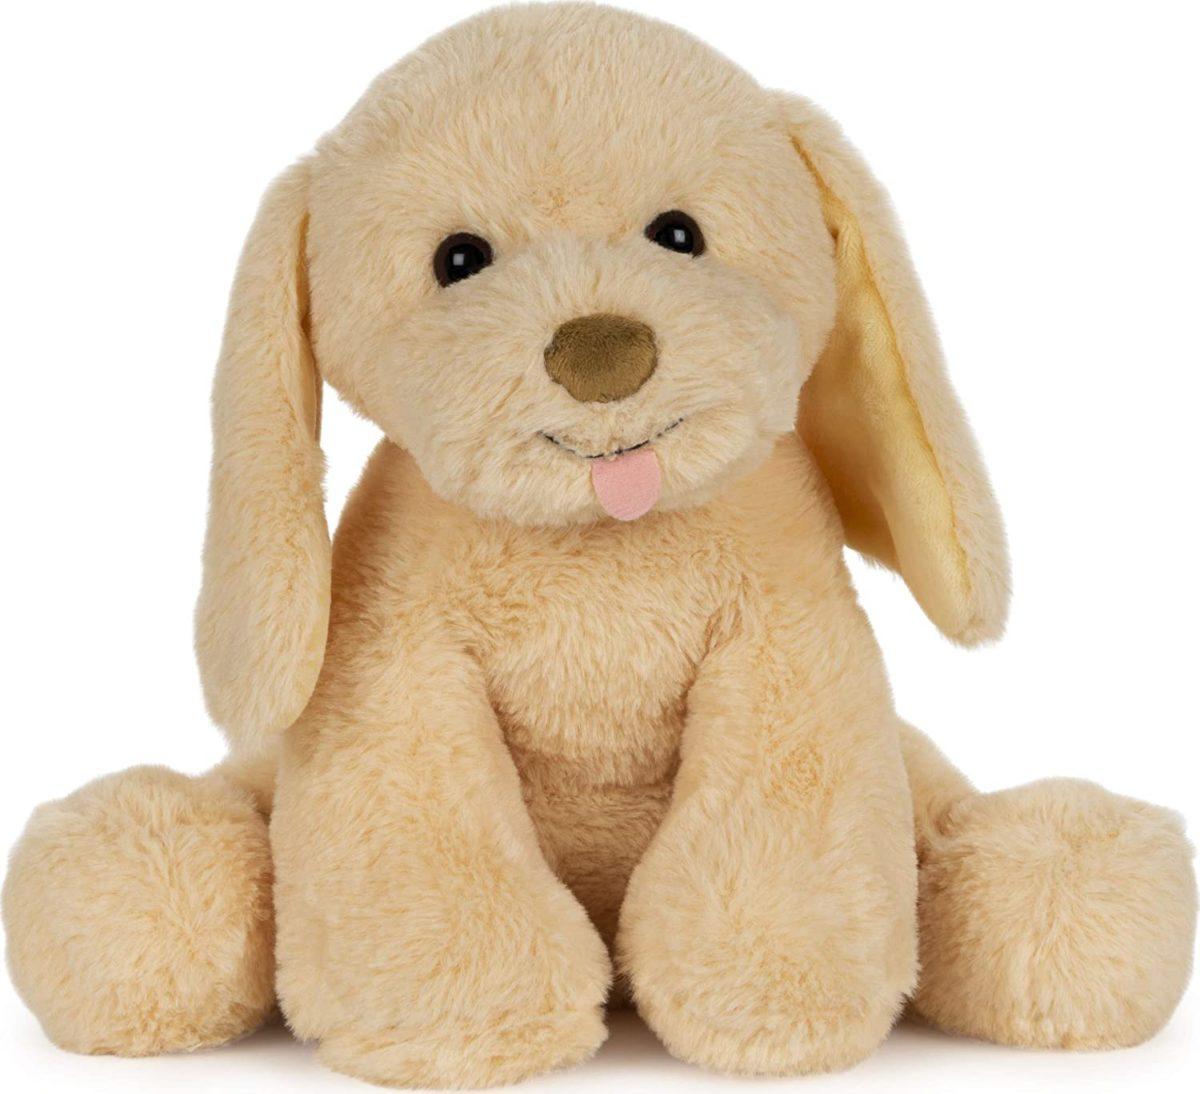 GUND Animated My Pet Puddles Puppy Plush Stuffed Animal Dog Sound and Movement Toy